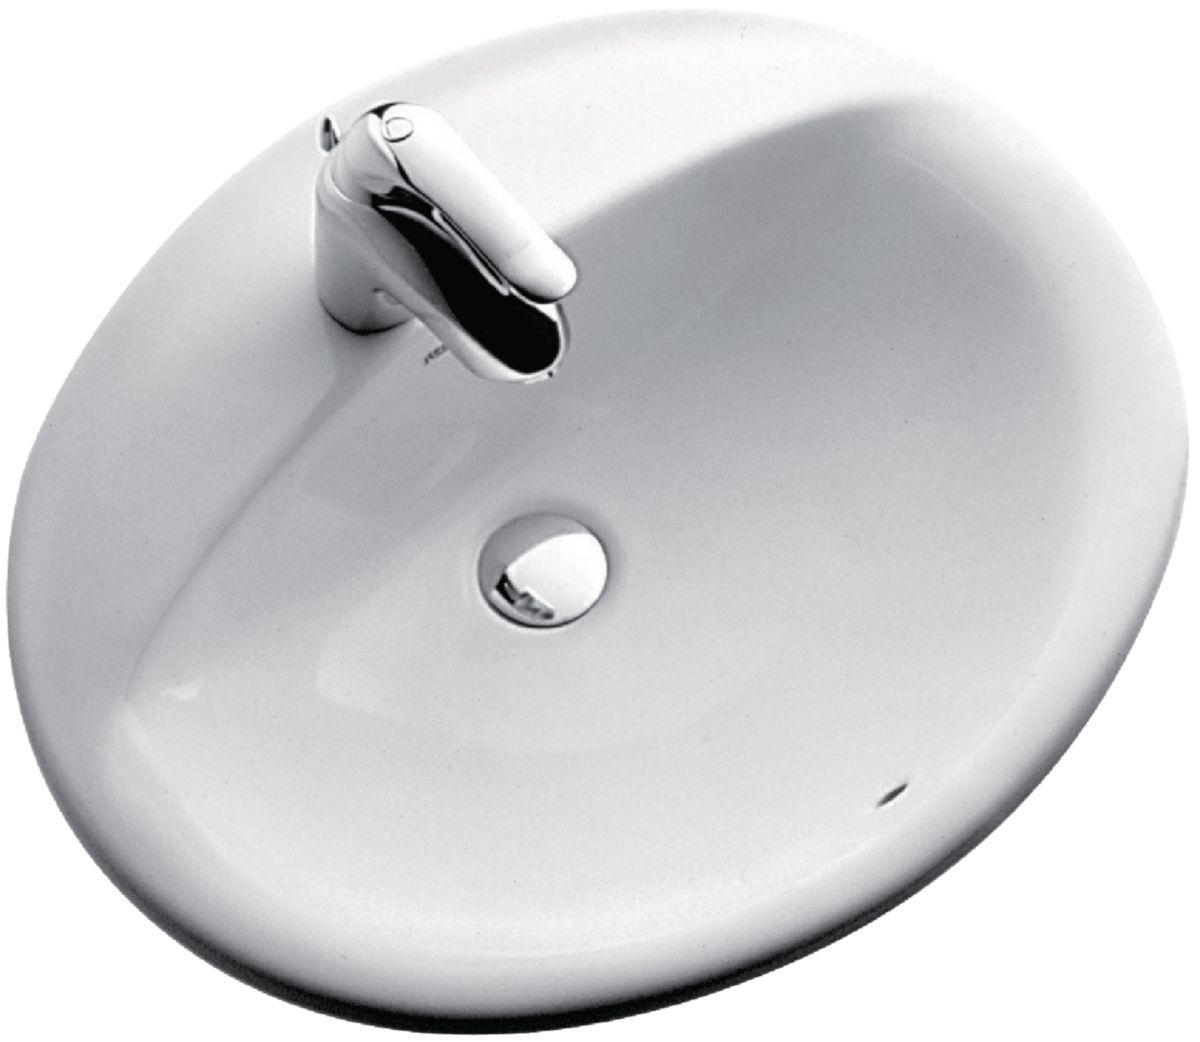 vasque a encastrer Vasque à encastrer ALOA 56 x 47,5 cm, avec trop-plein, ...